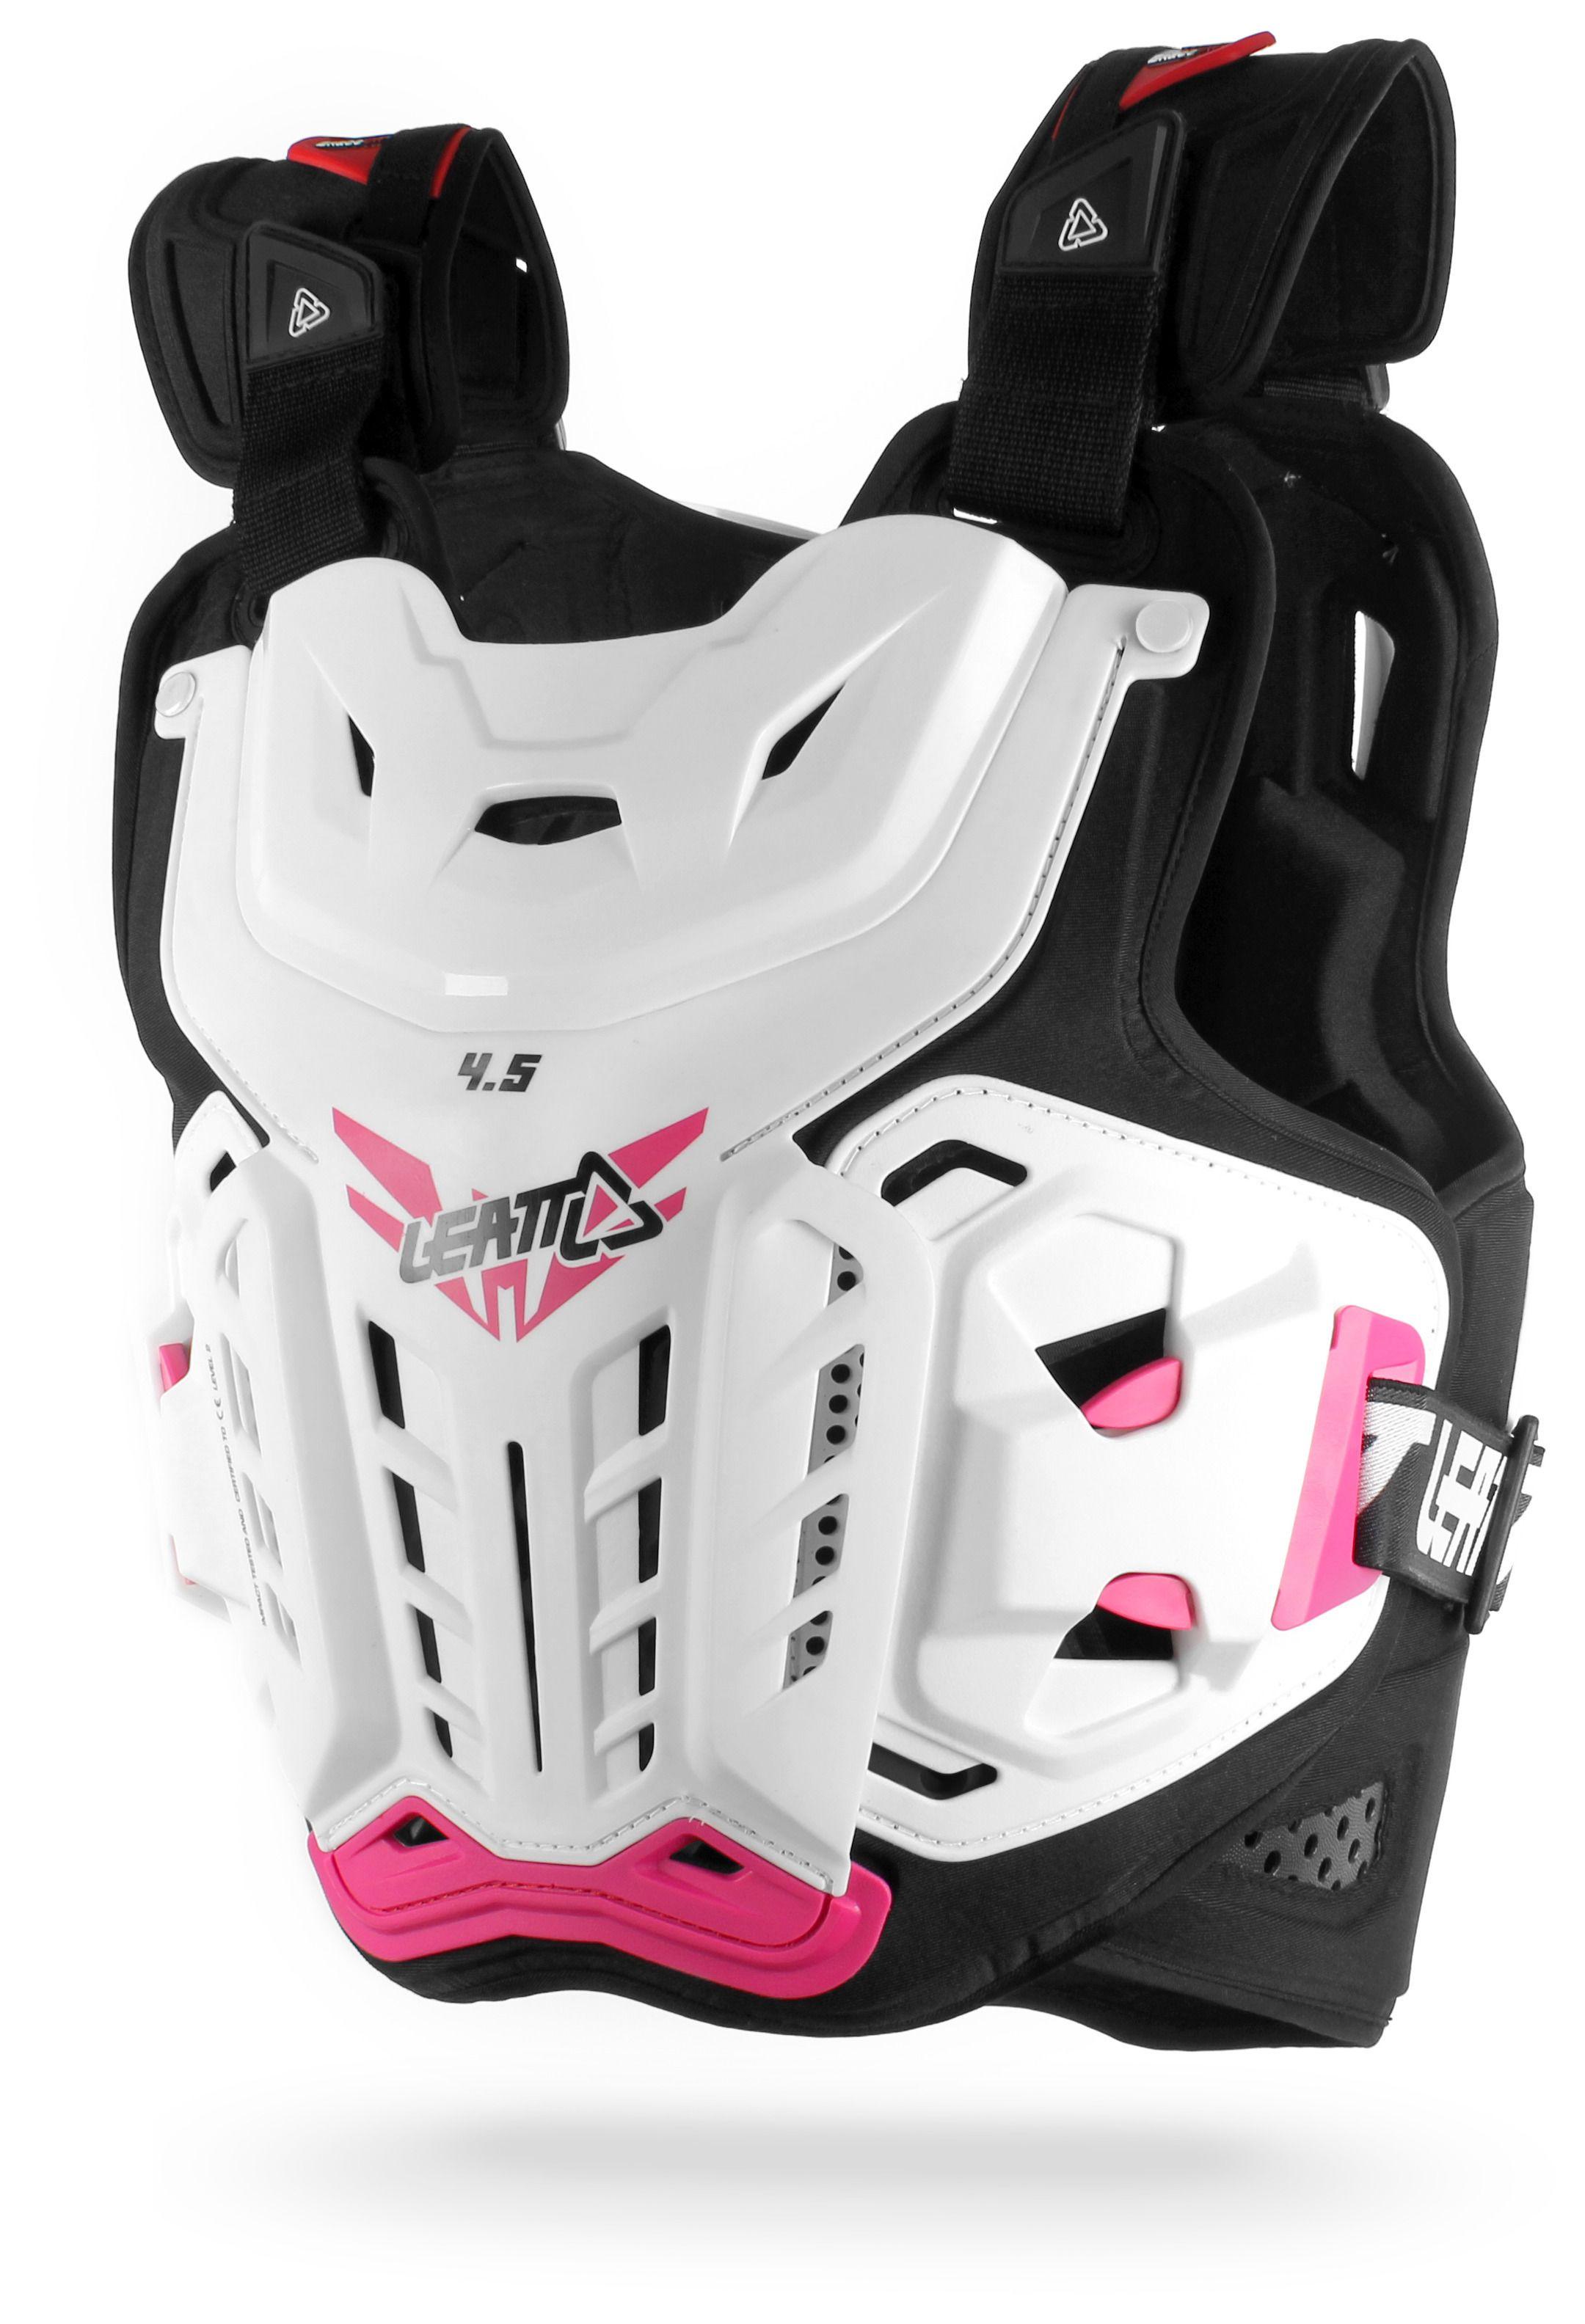 Pro Taper Handlebars >> Leatt 4.5 Jacki Chest Protector / Women's - Cycle Gear